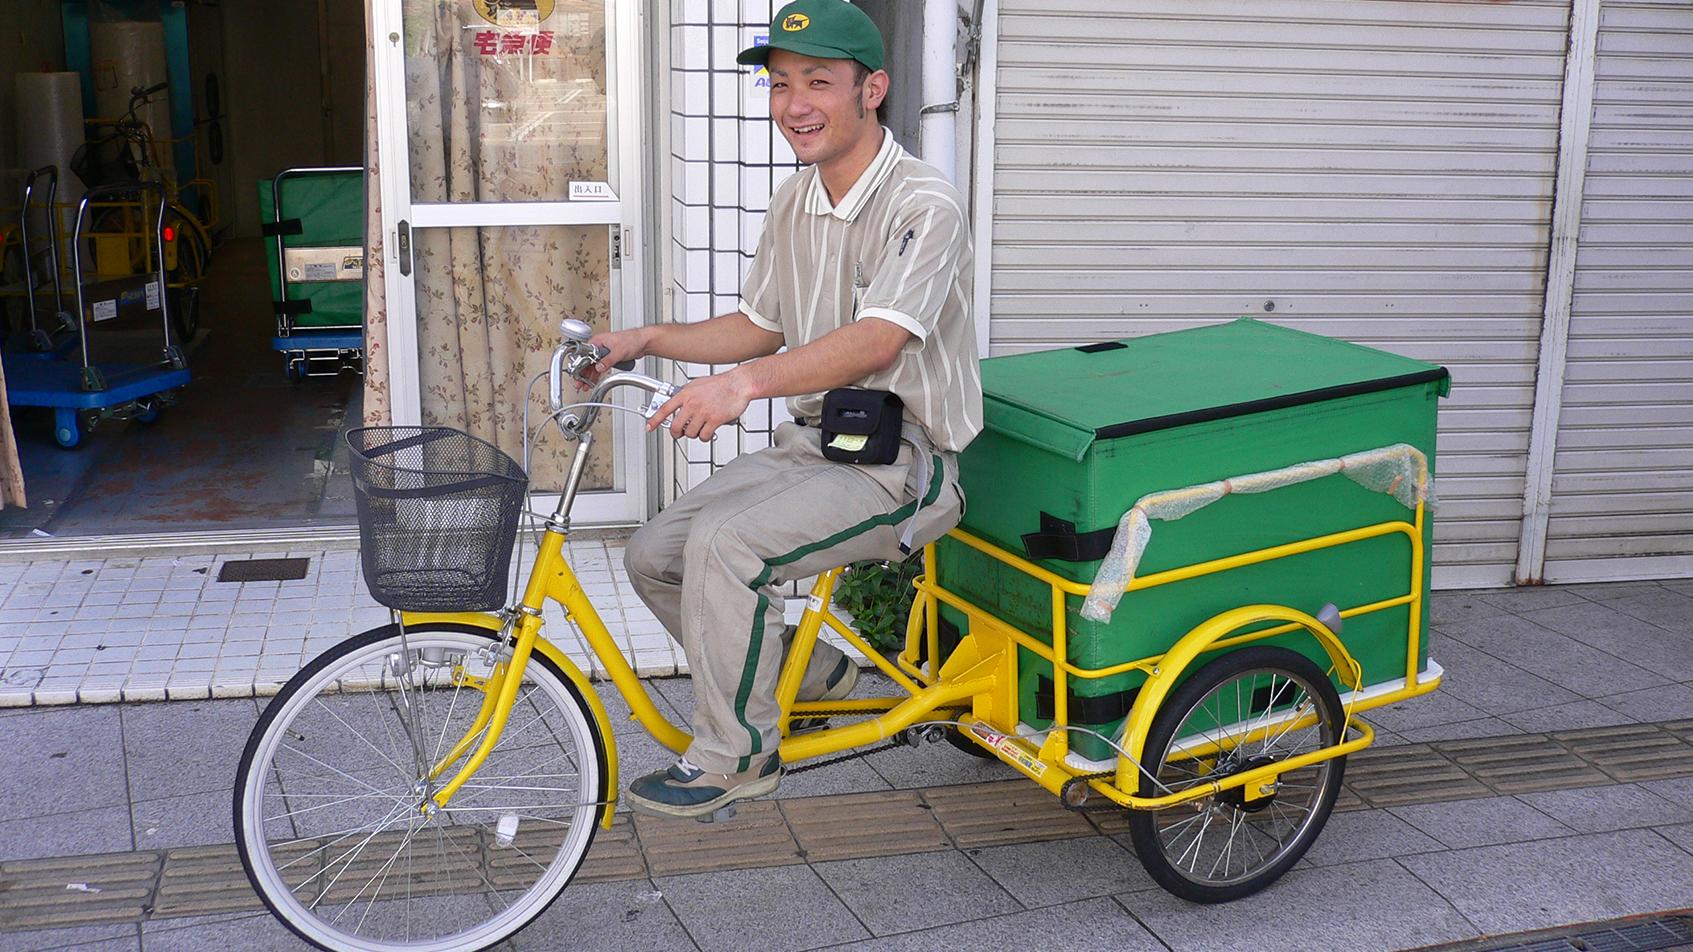 中村輪業製品:3輪自転車(ヤマト運輸)